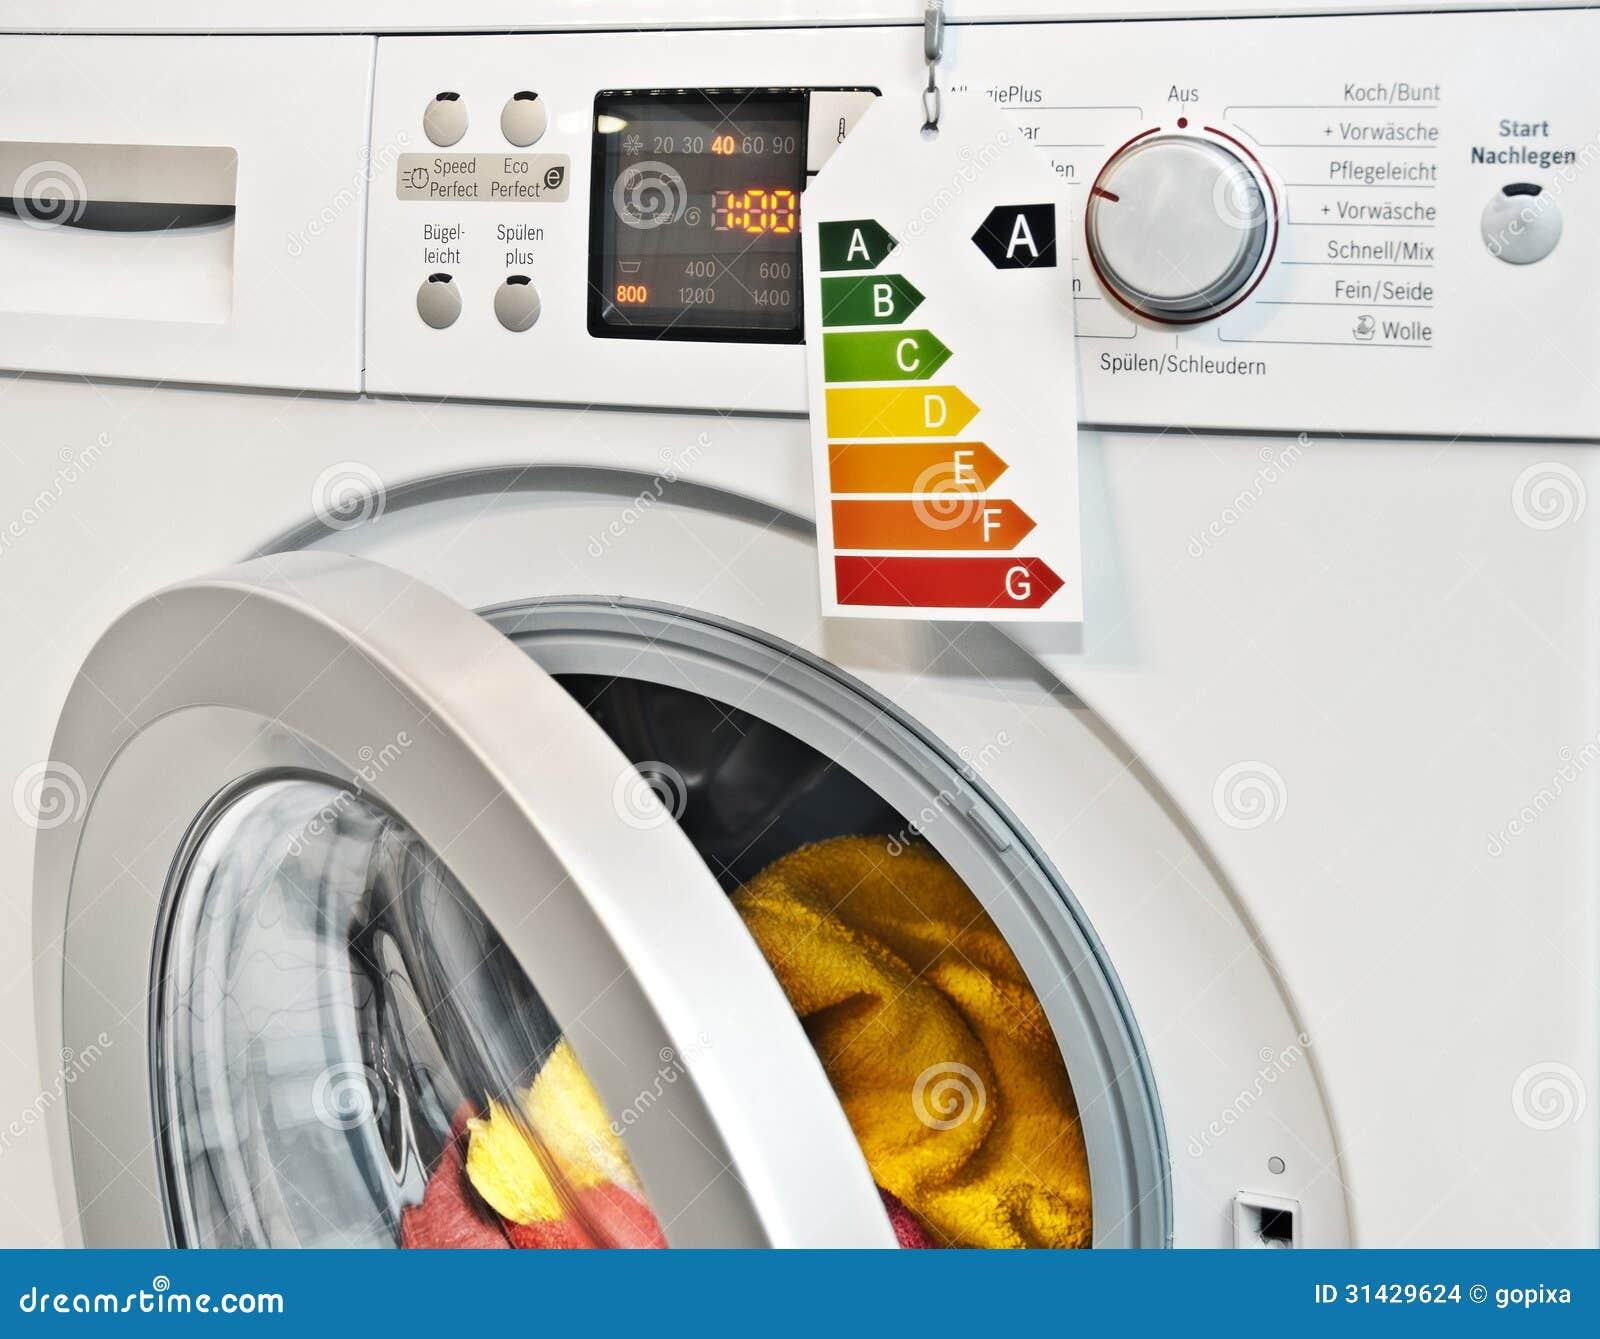 energy washing machine